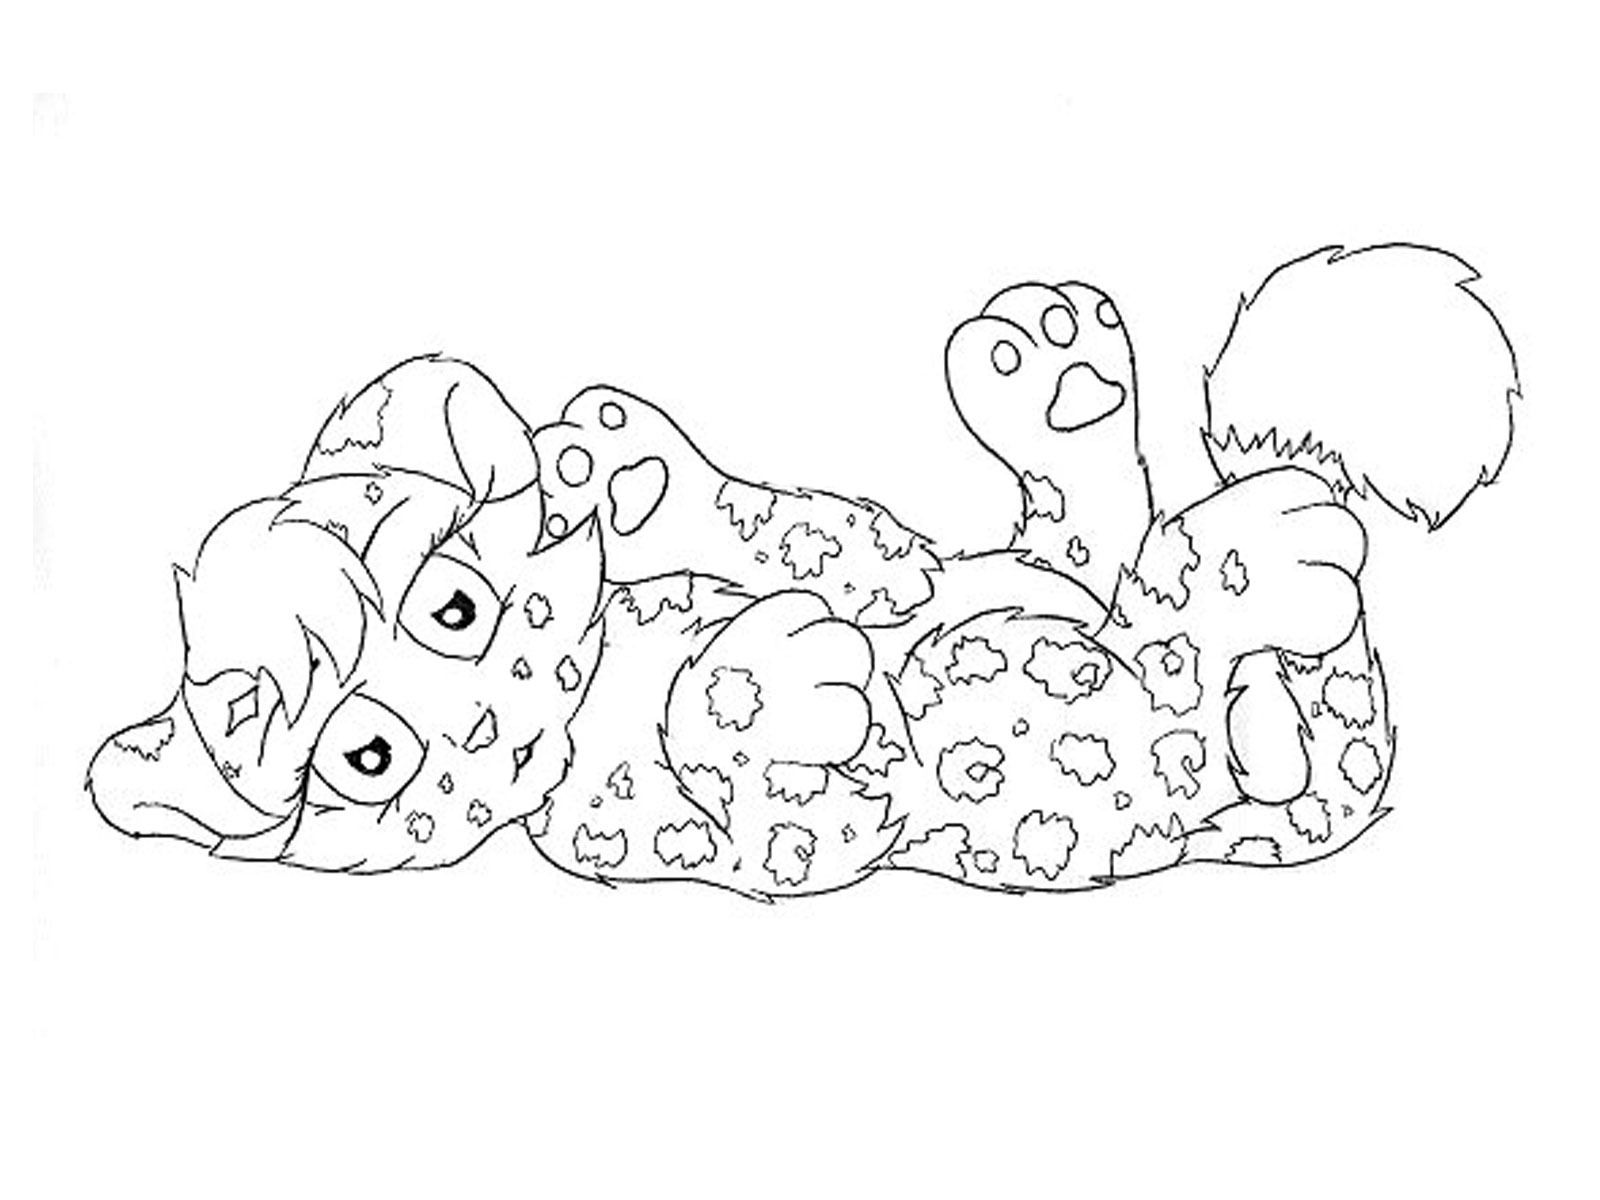 Baby Jaguar Coloring Pages Giraffe Coloring Pages Animal Coloring Pages Coloring Pages